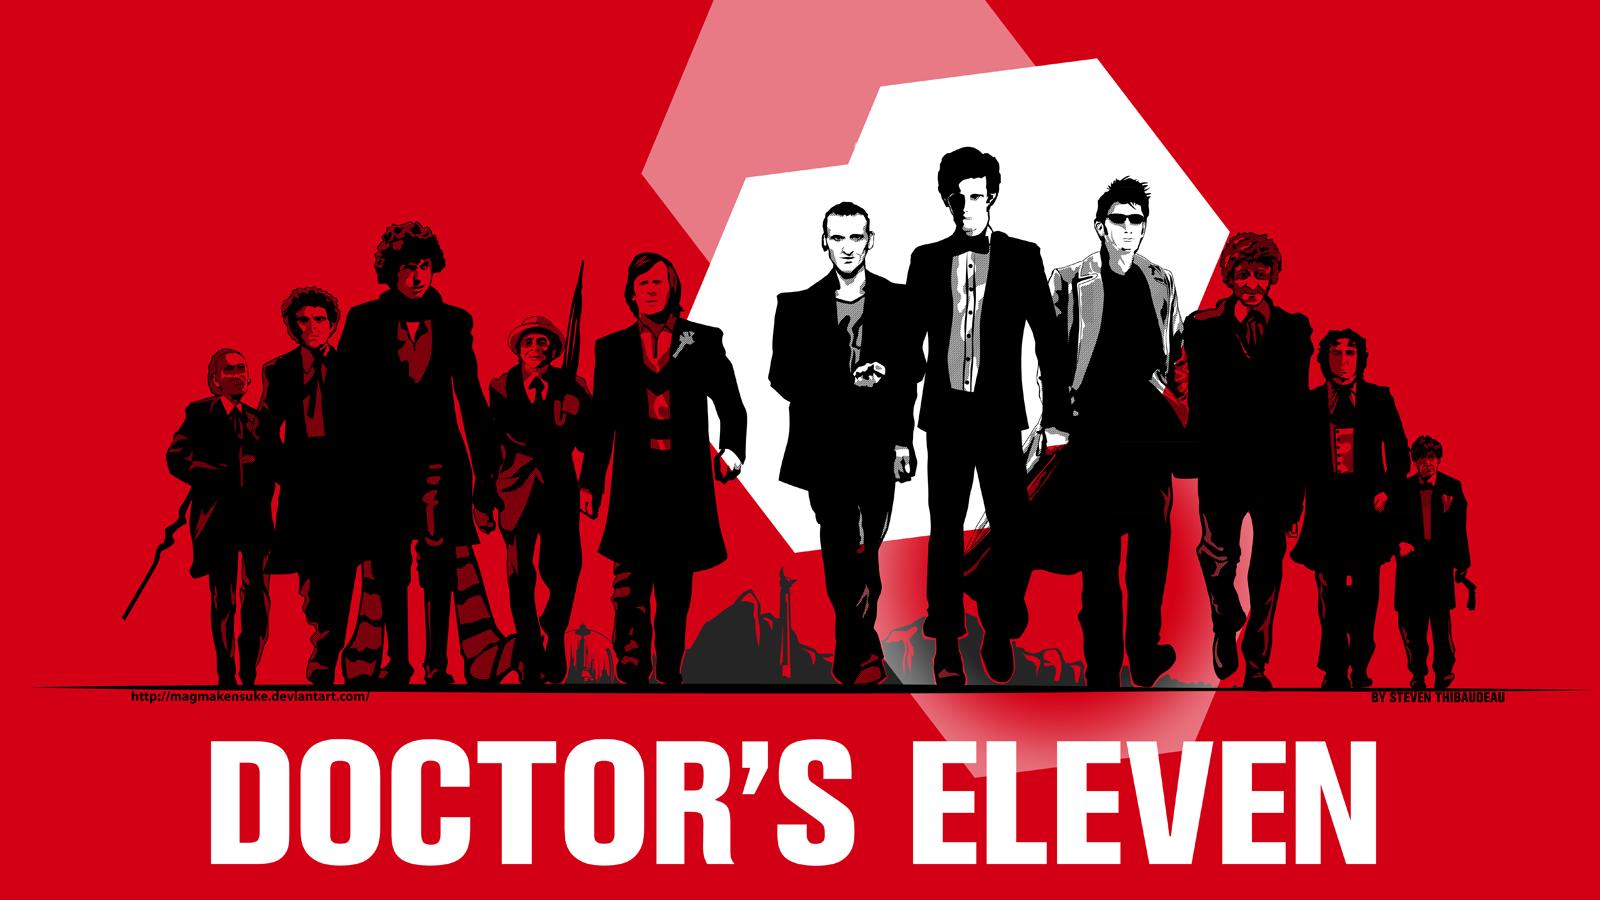 Future Doctor Wallpaper an Error Occurred